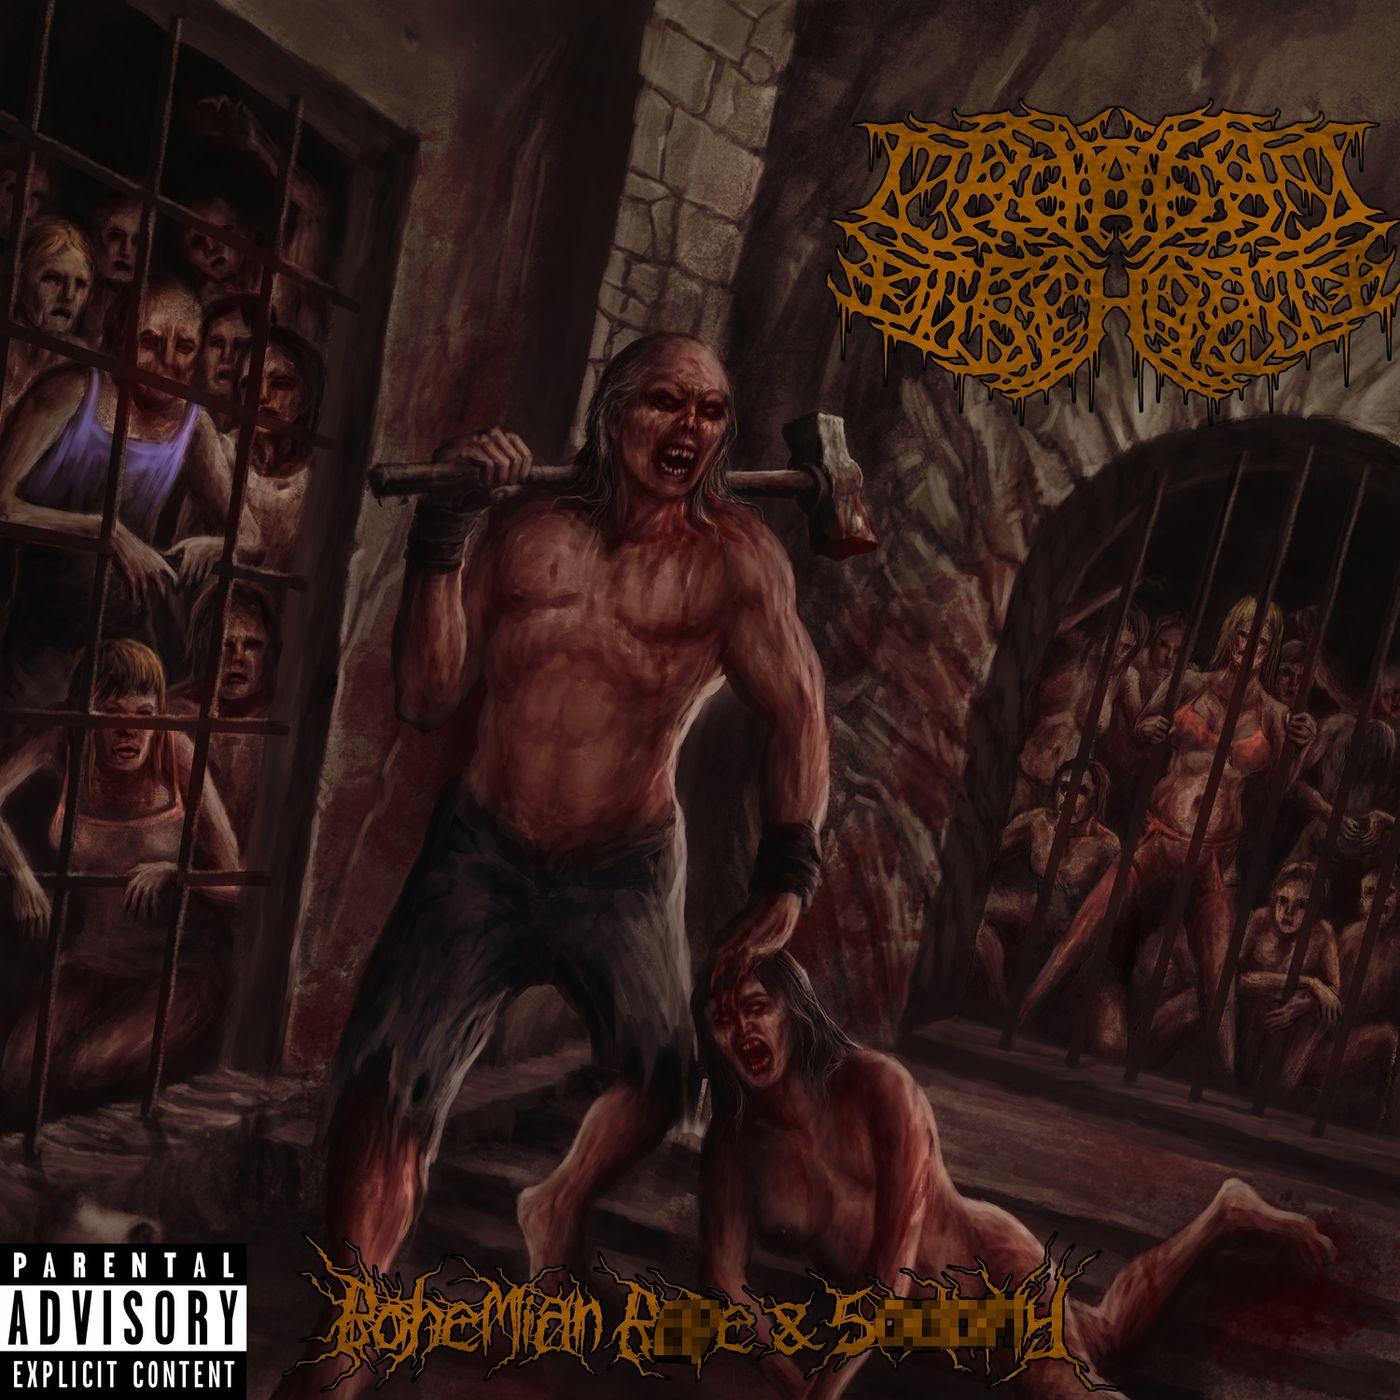 Cranial Discharge - Bohemian Rape & Sodomy